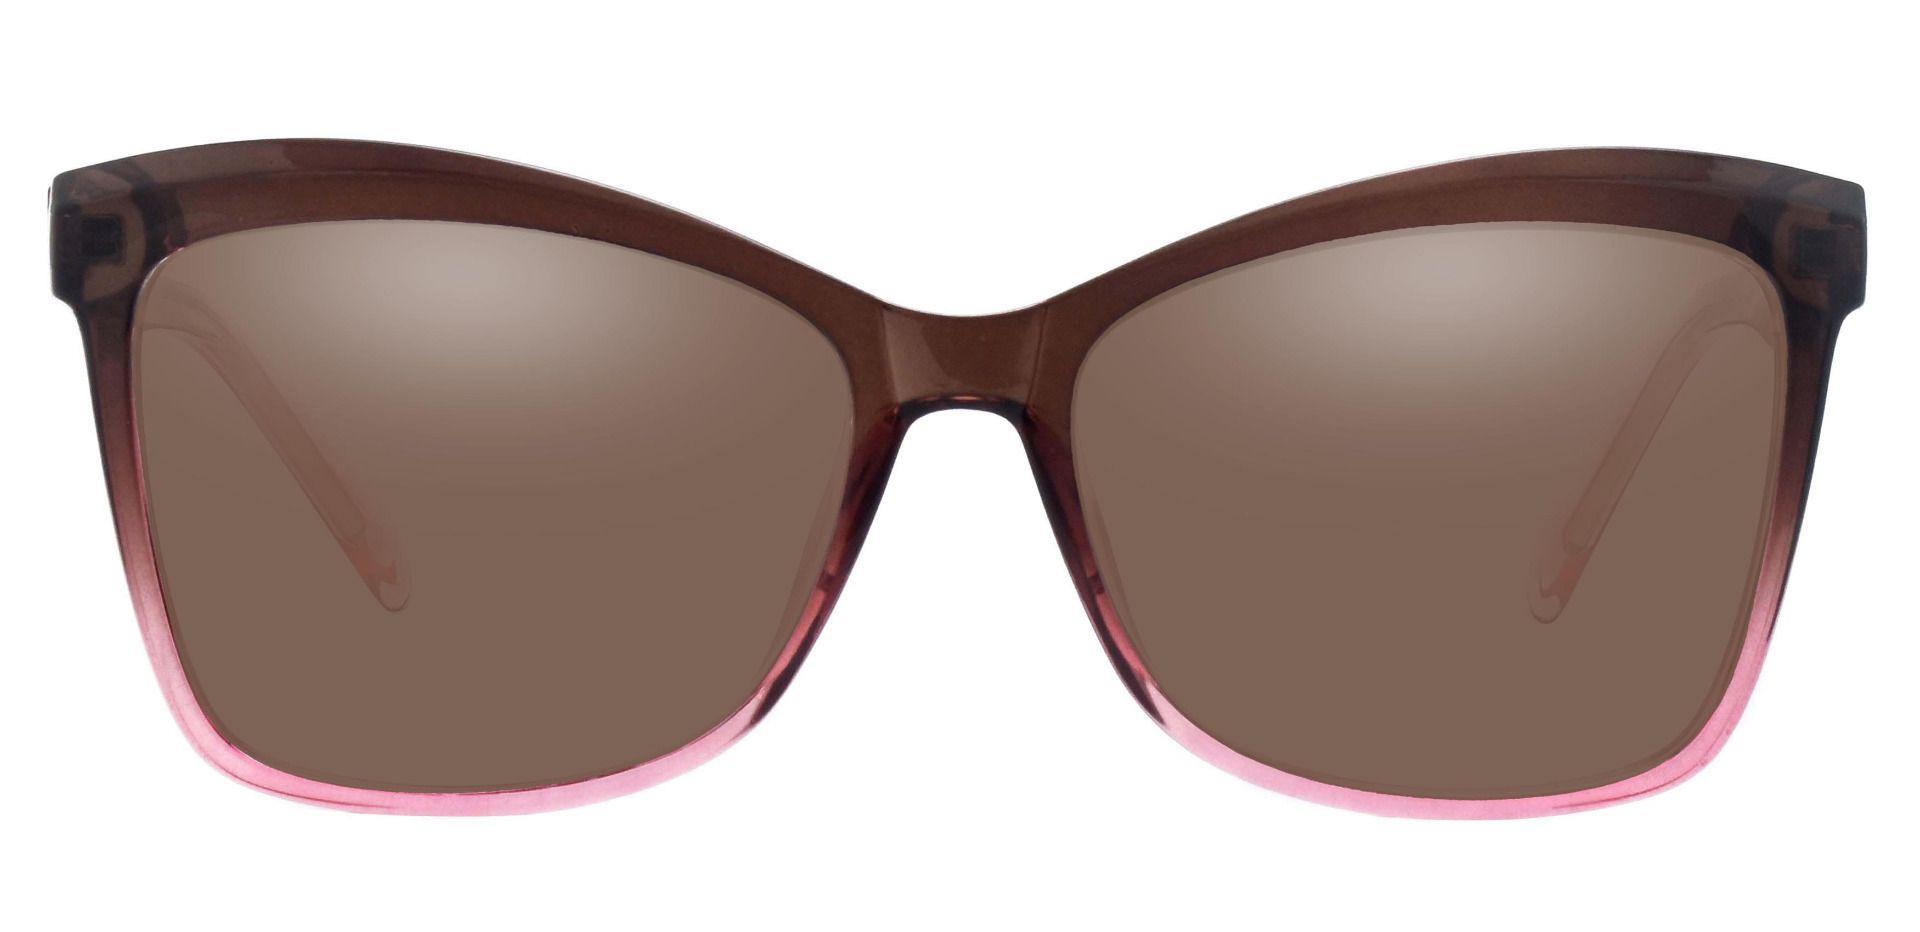 Lexi Cat Eye Progressive Sunglasses - Brown Frame With Brown Lenses